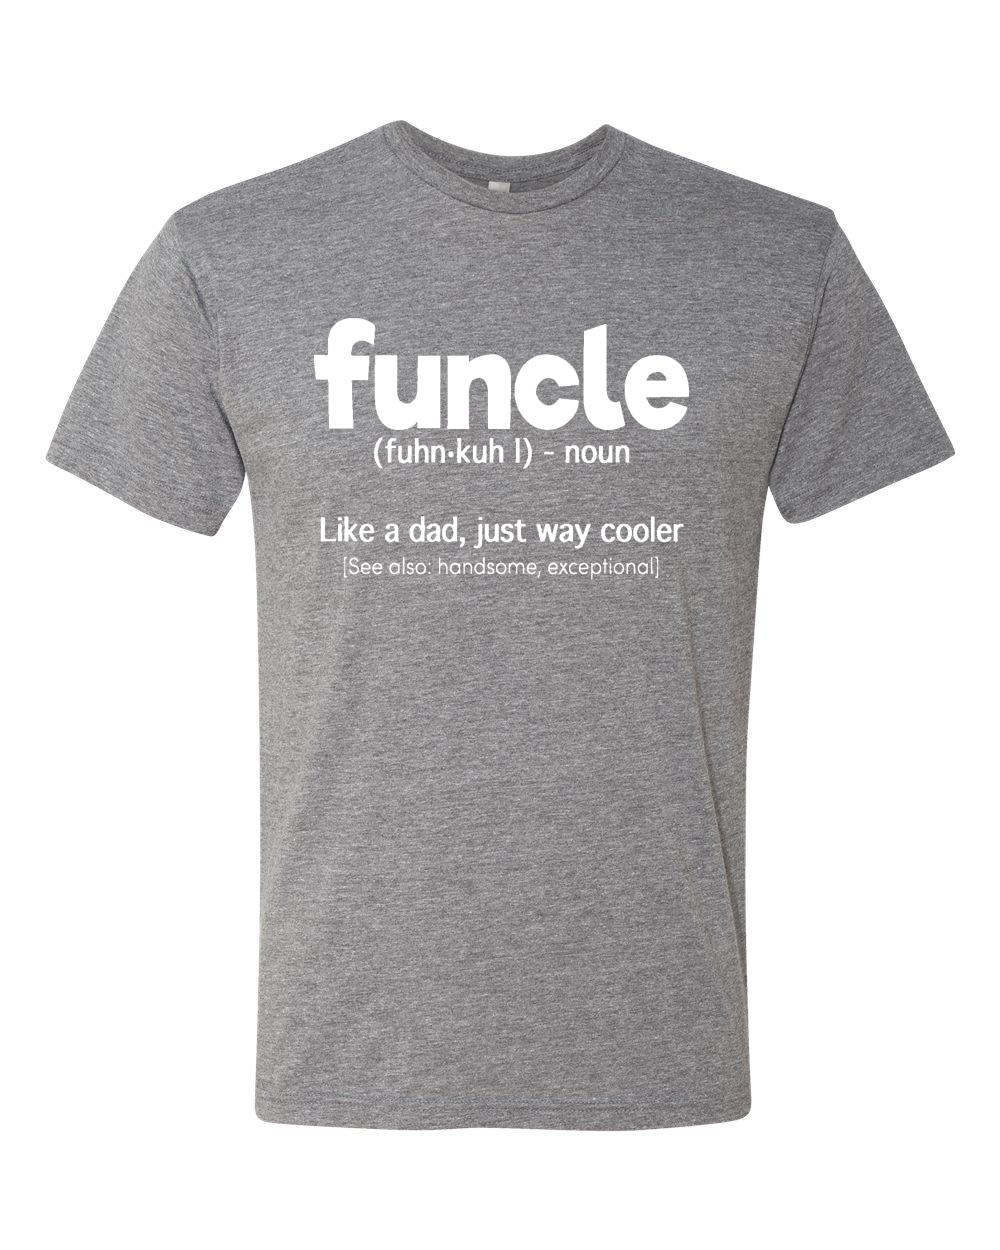 Funcle Fun Uncle Soft Premium Humor T Shirt Nephew Niece Gift Tee